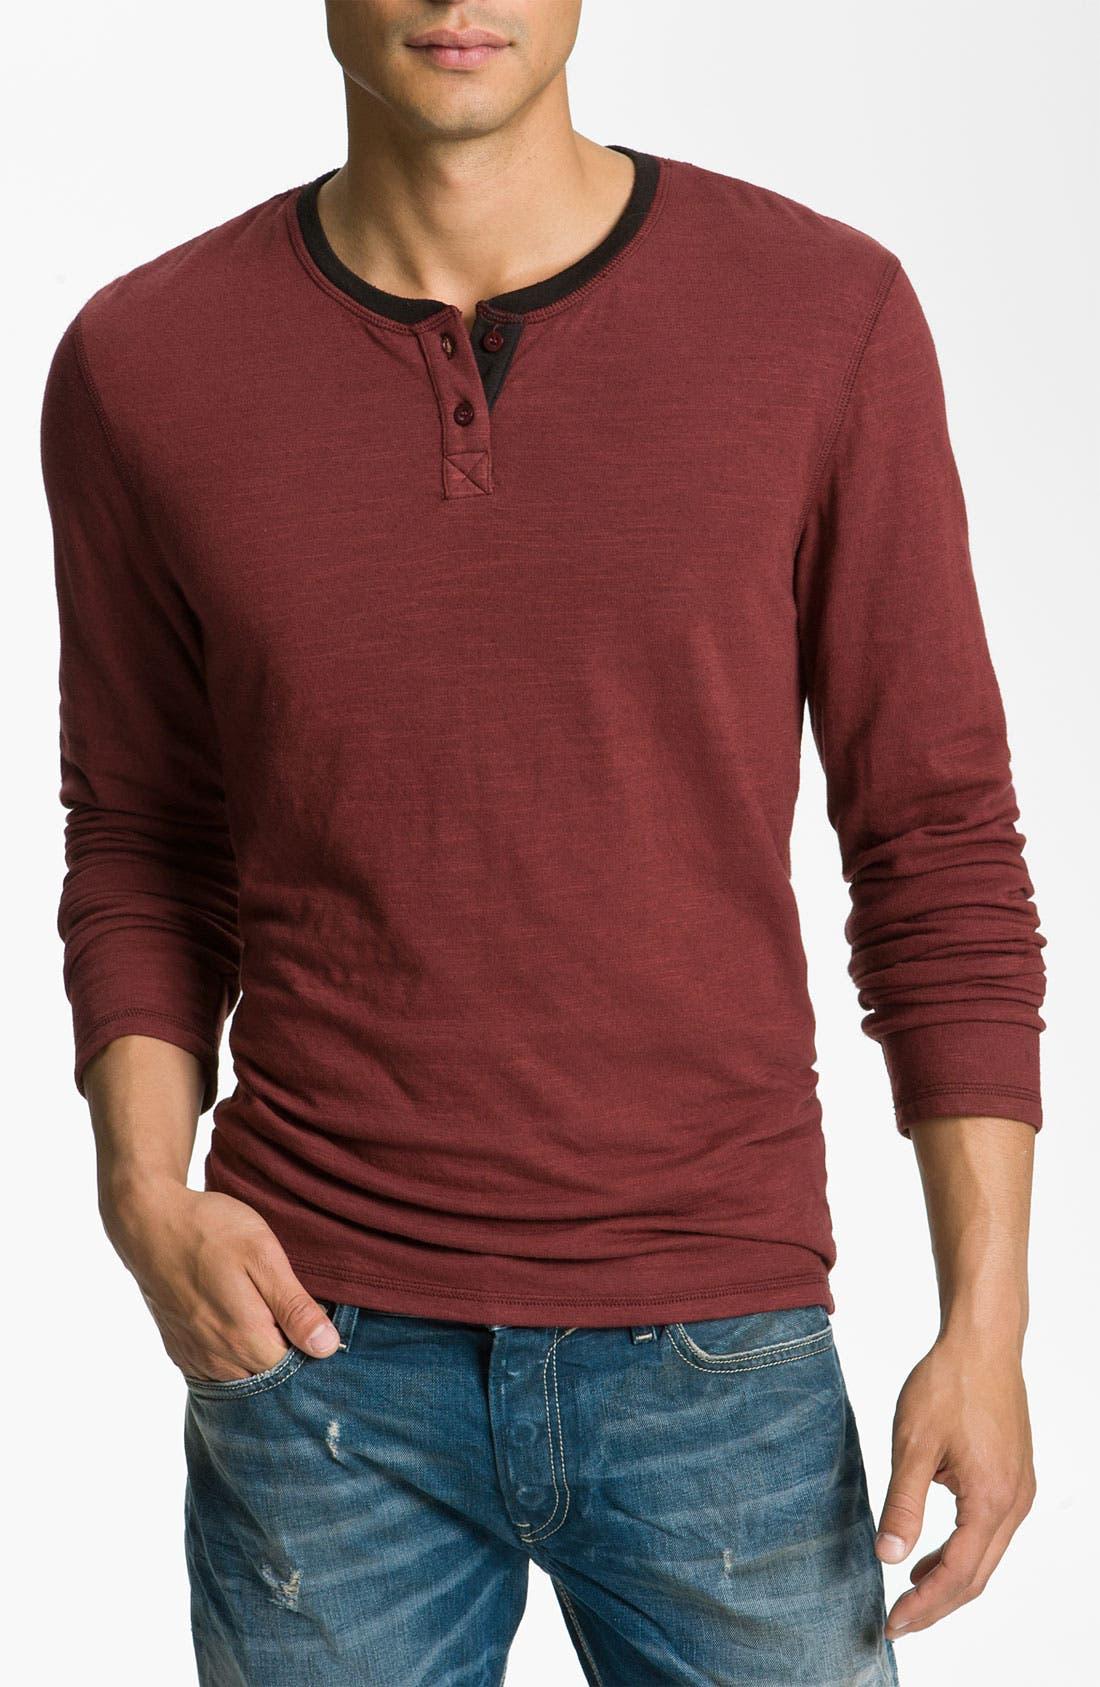 Main Image - NSF Clothing 'Bo' Slub Knit Henley